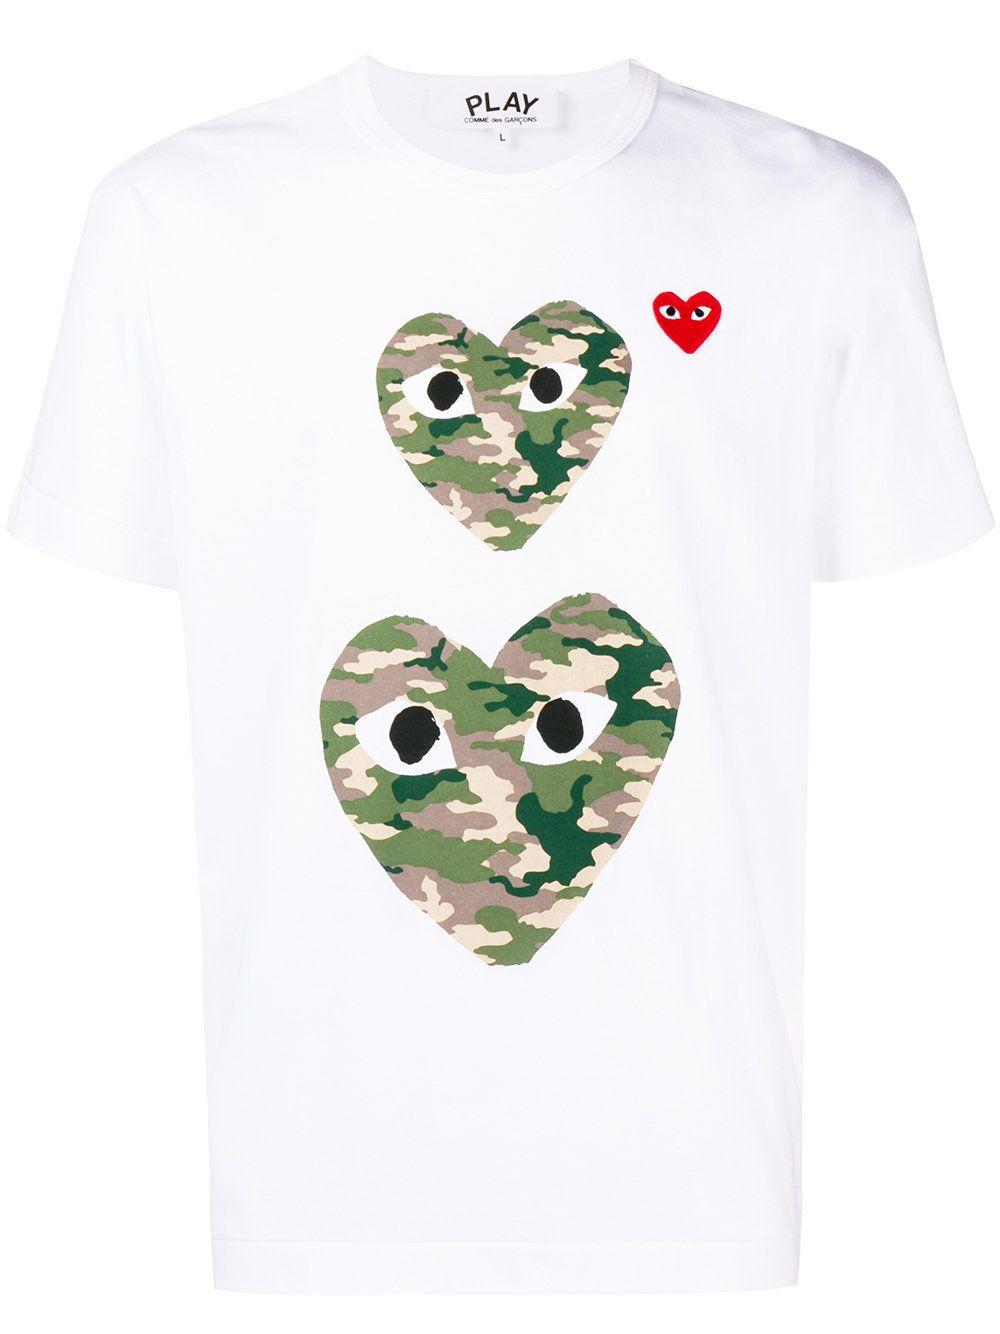 Play Heart Logo Camouflage Garcons ShirtShirts Comme Des T jUVSLqGzMp